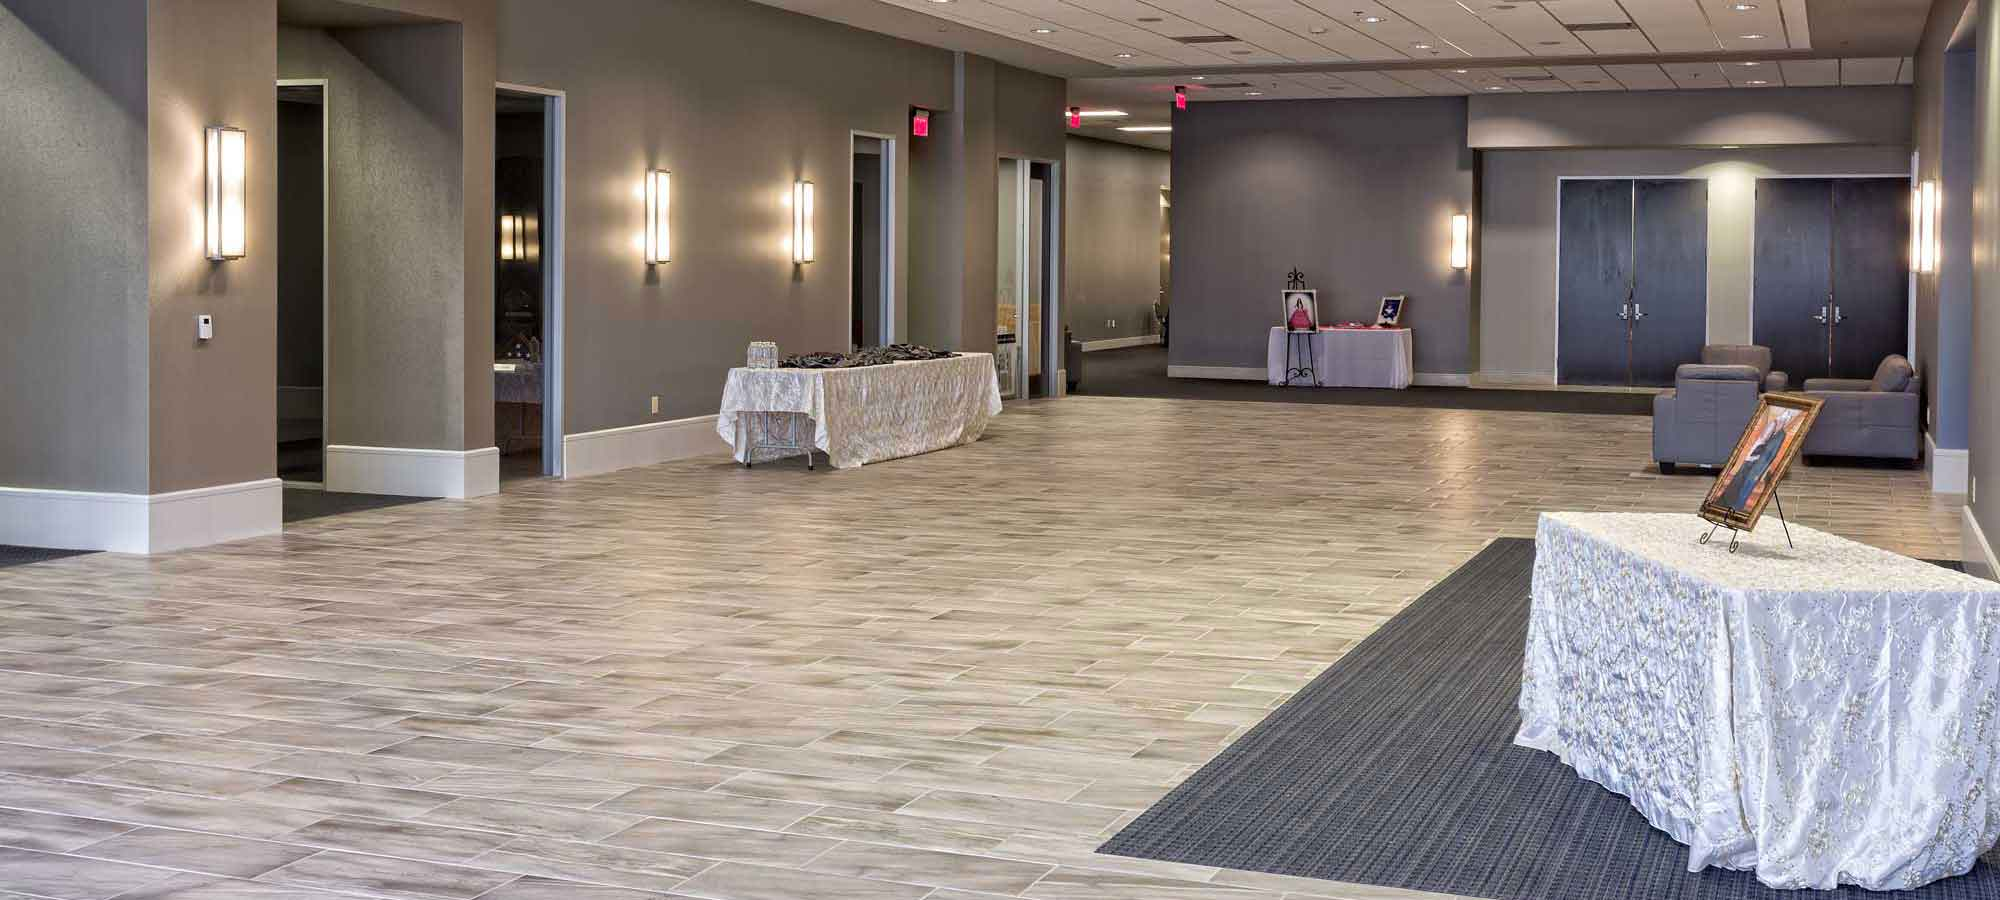 Norris Centers San Antonio elegant gray foyer